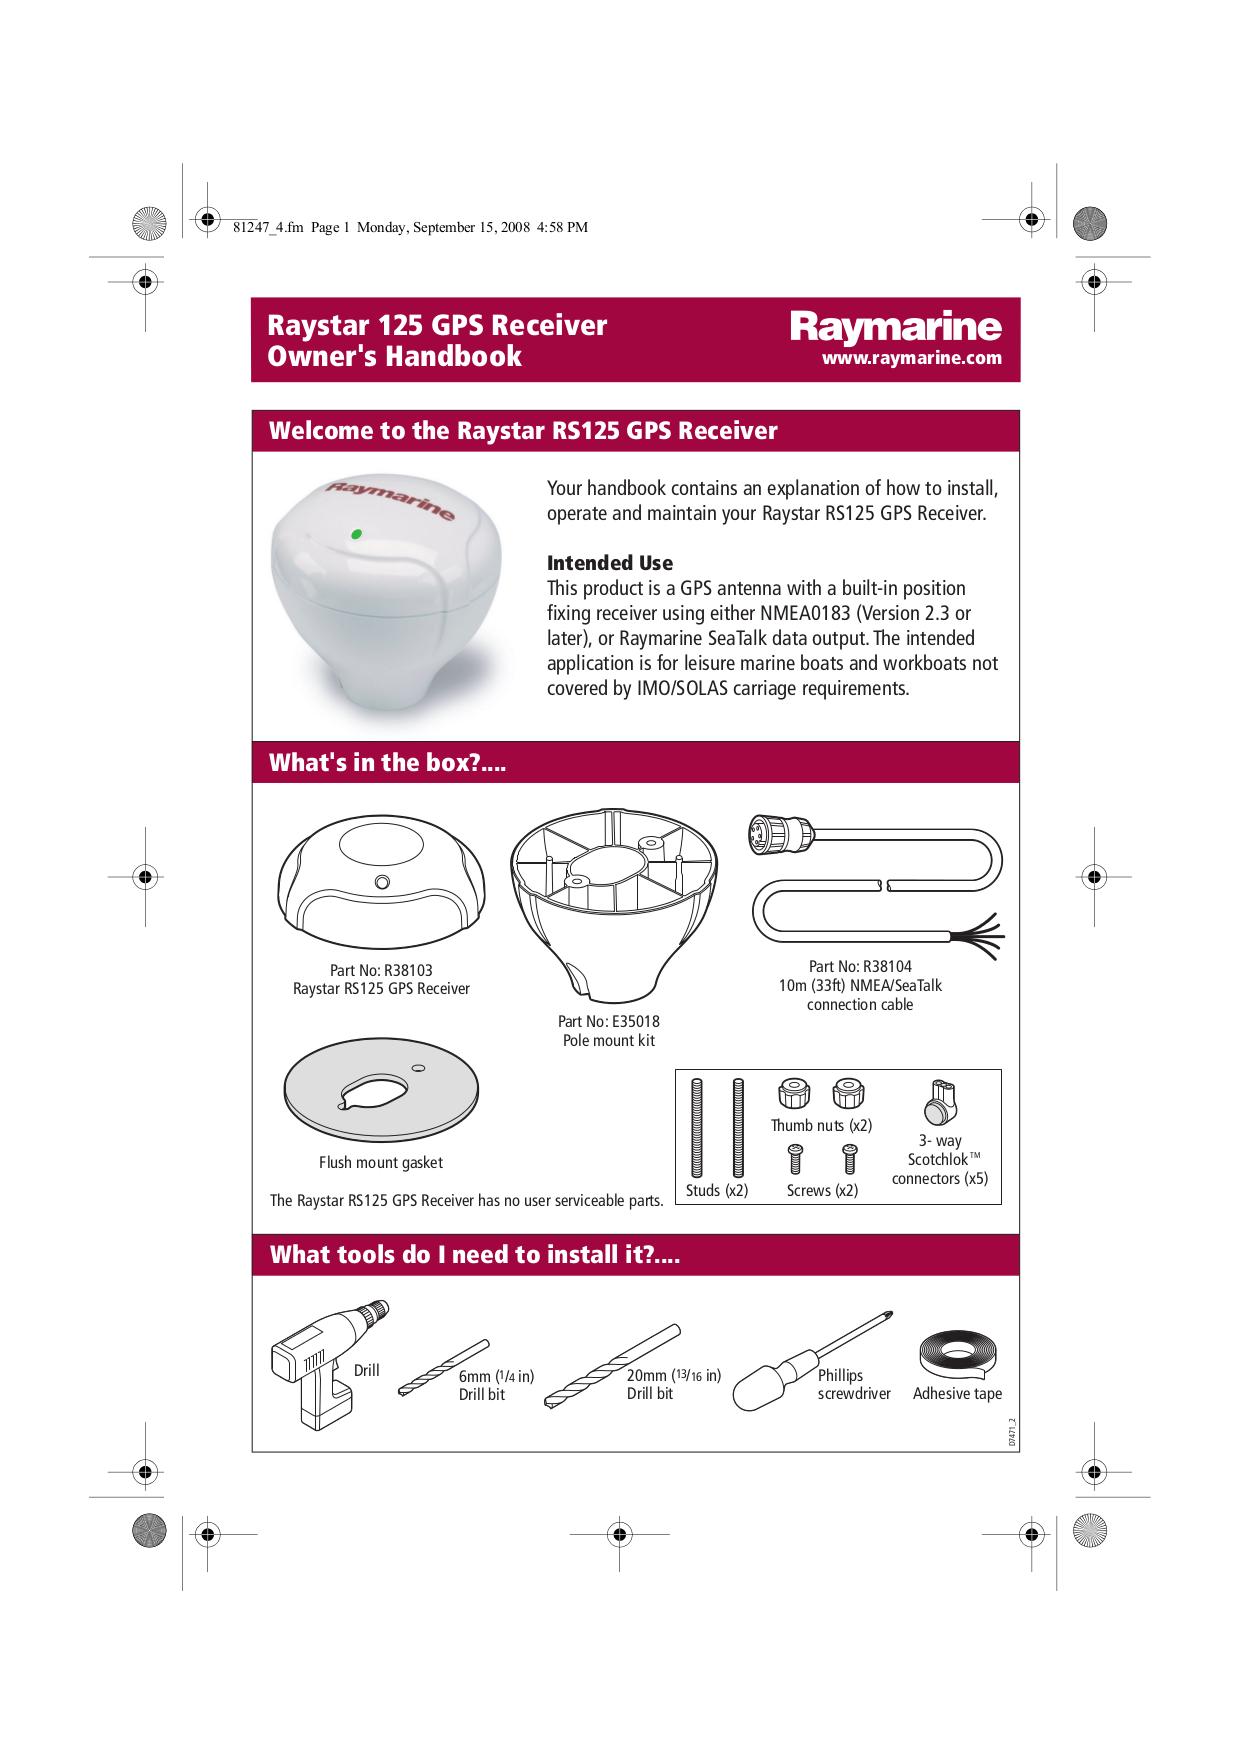 E120 Raymarine owners manual